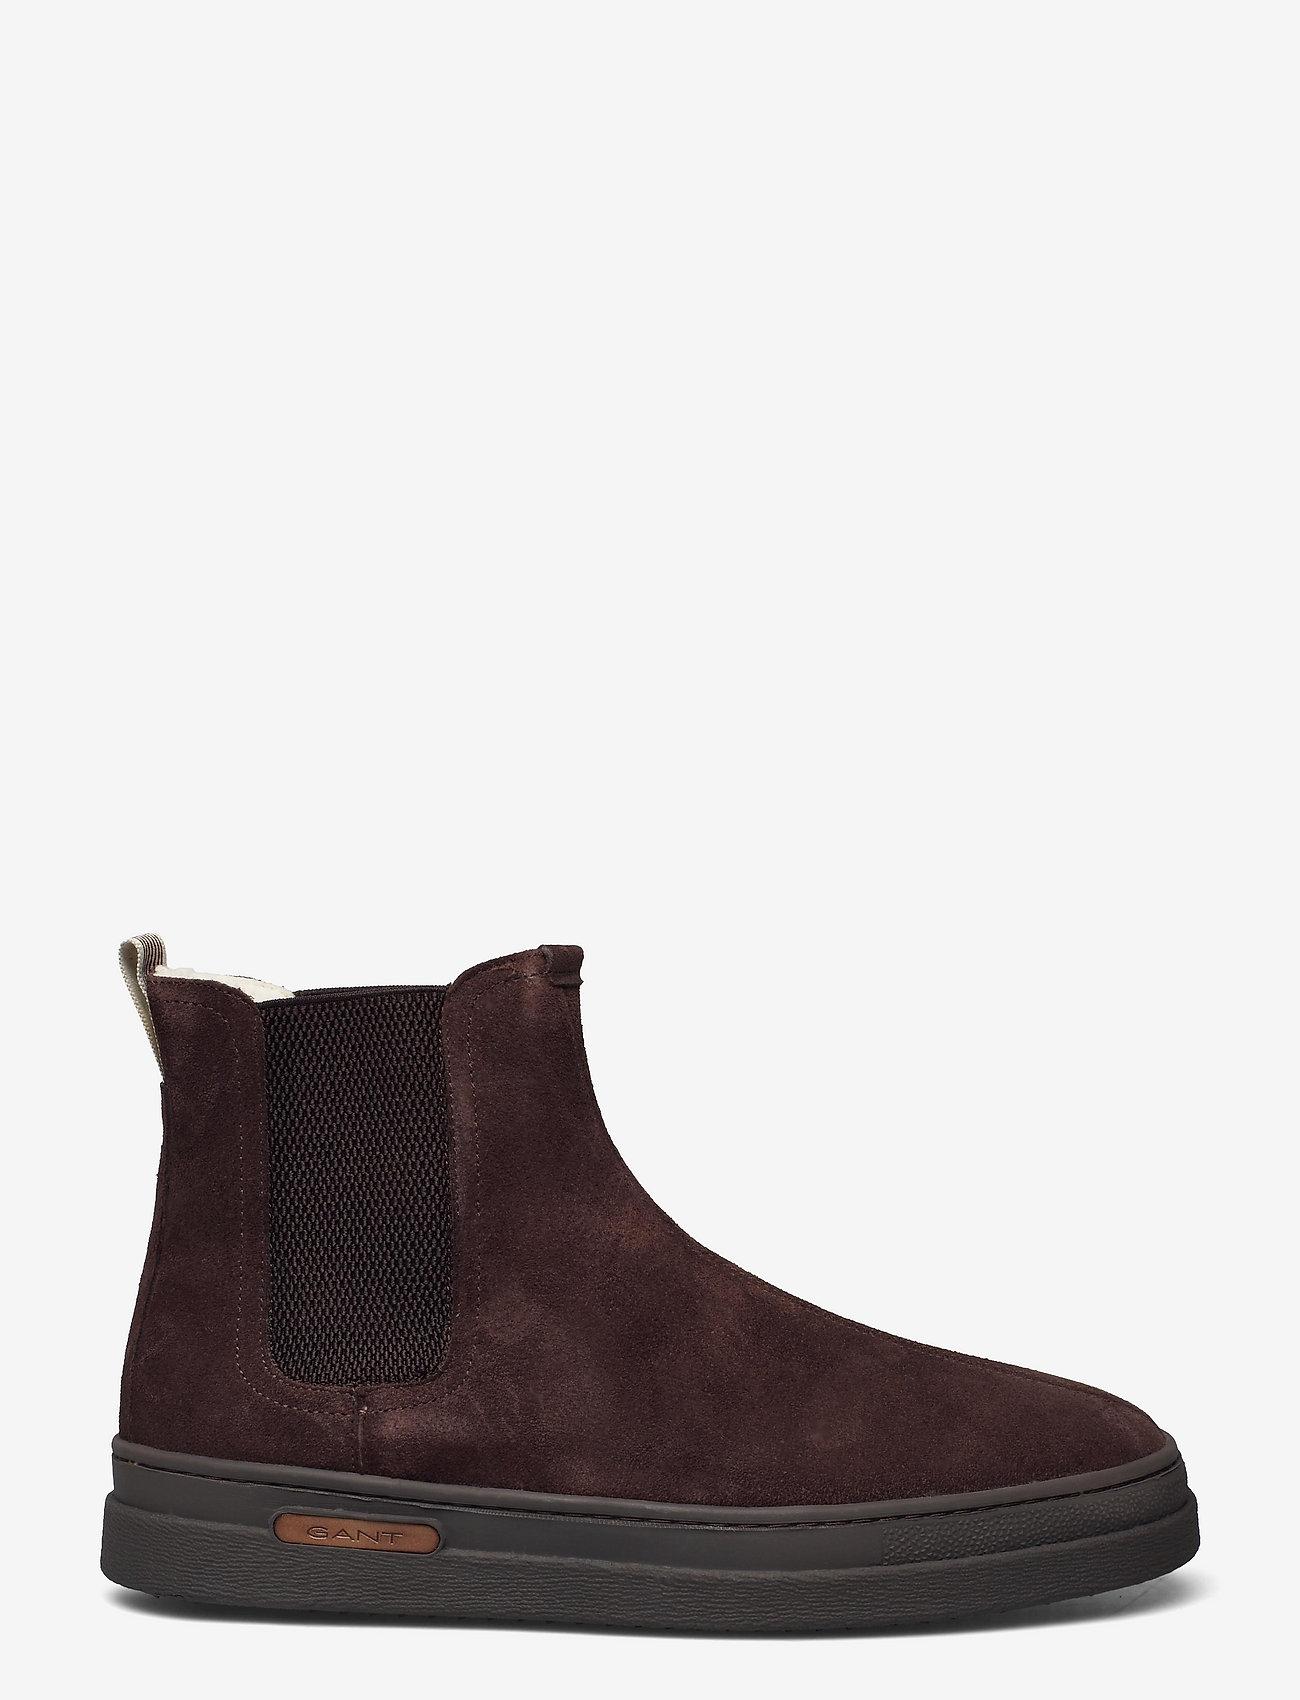 GANT - Cloyd Chelsea - chelsea boots - dark brown - 1